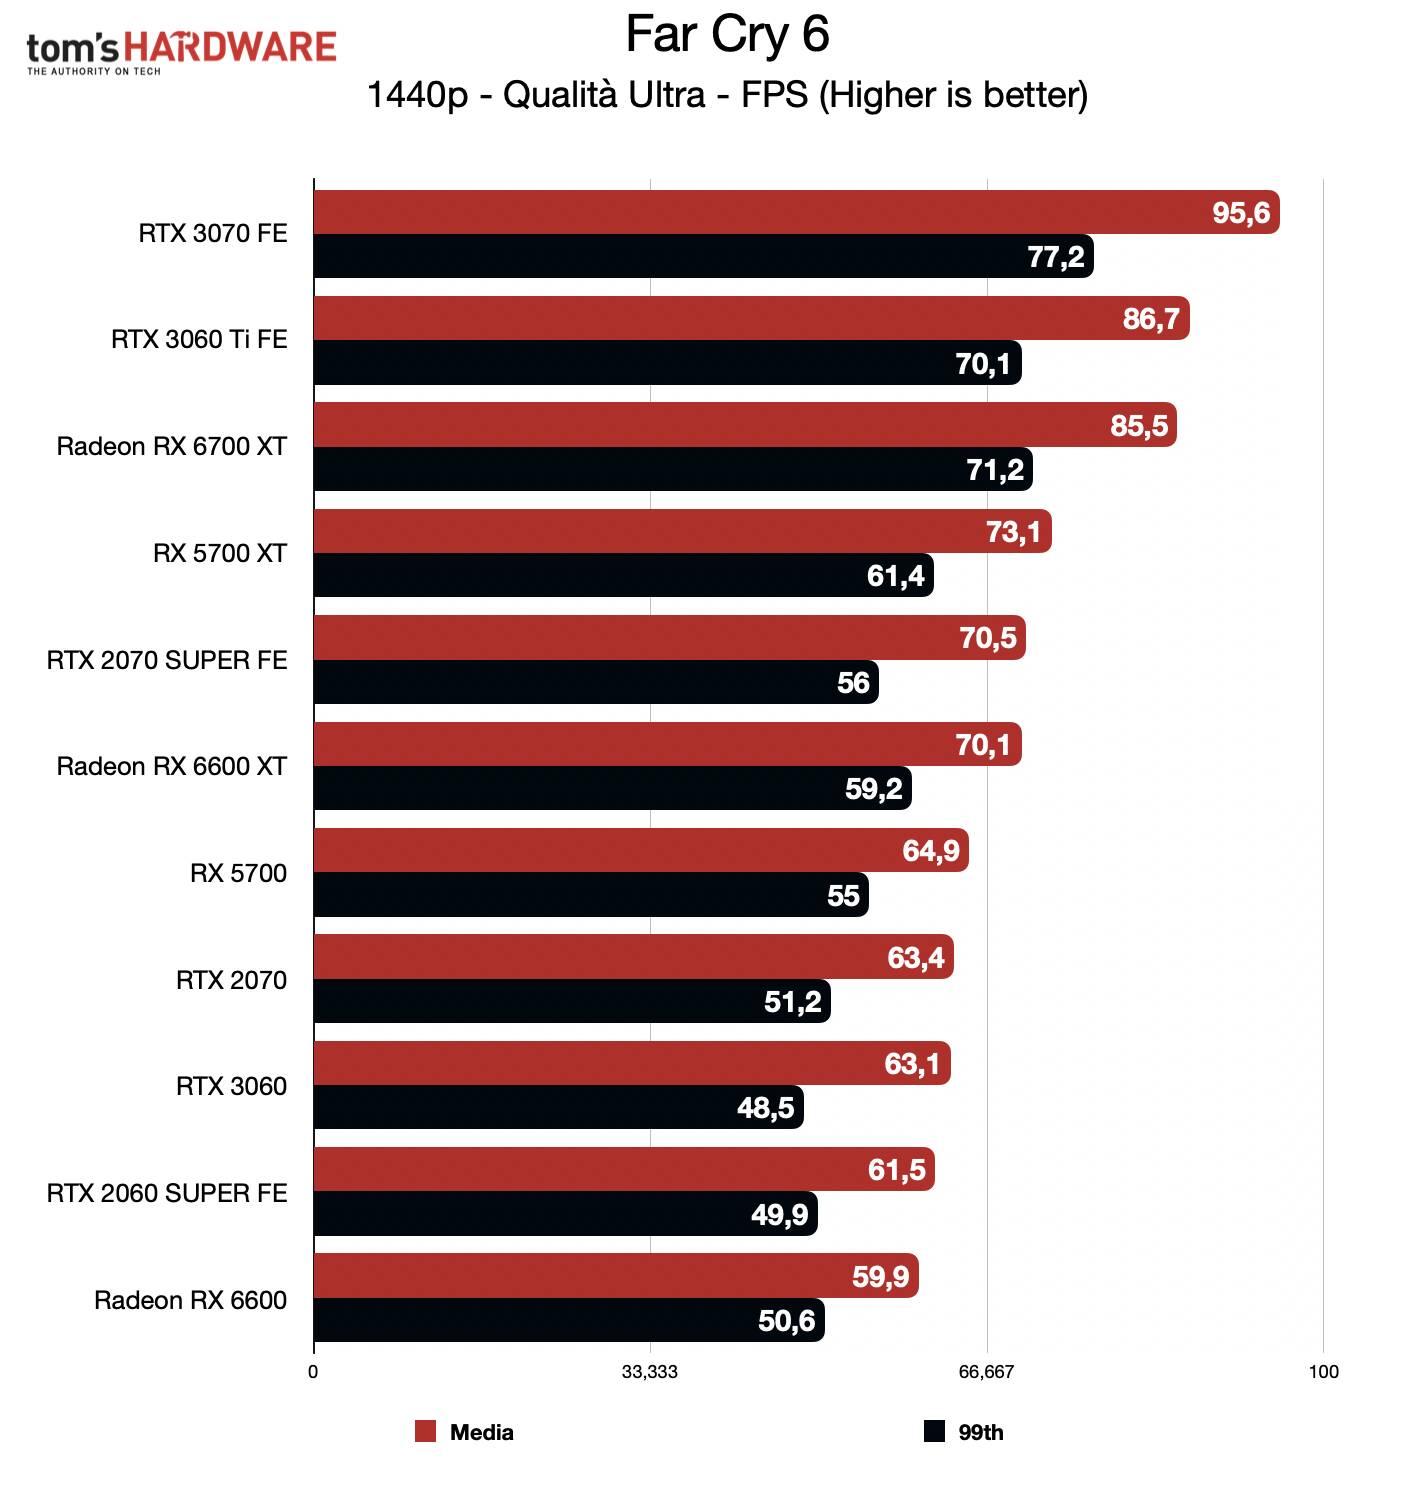 Benchmark Radeon RX 6600 - QHD - Far Cry 6